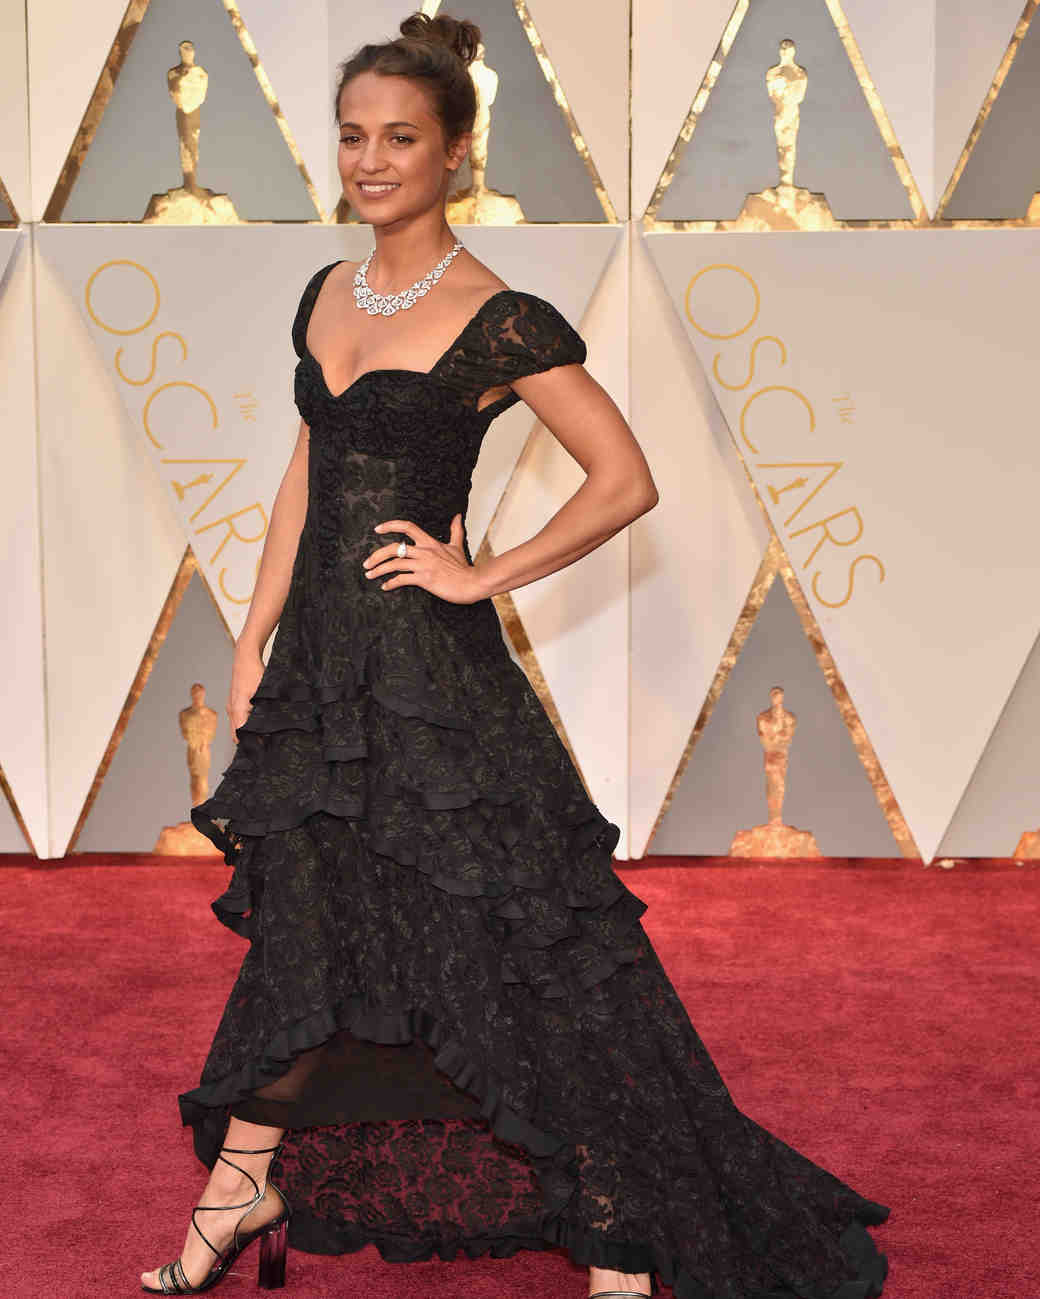 Alicia Vikander 2017 OscarsRed Carpet